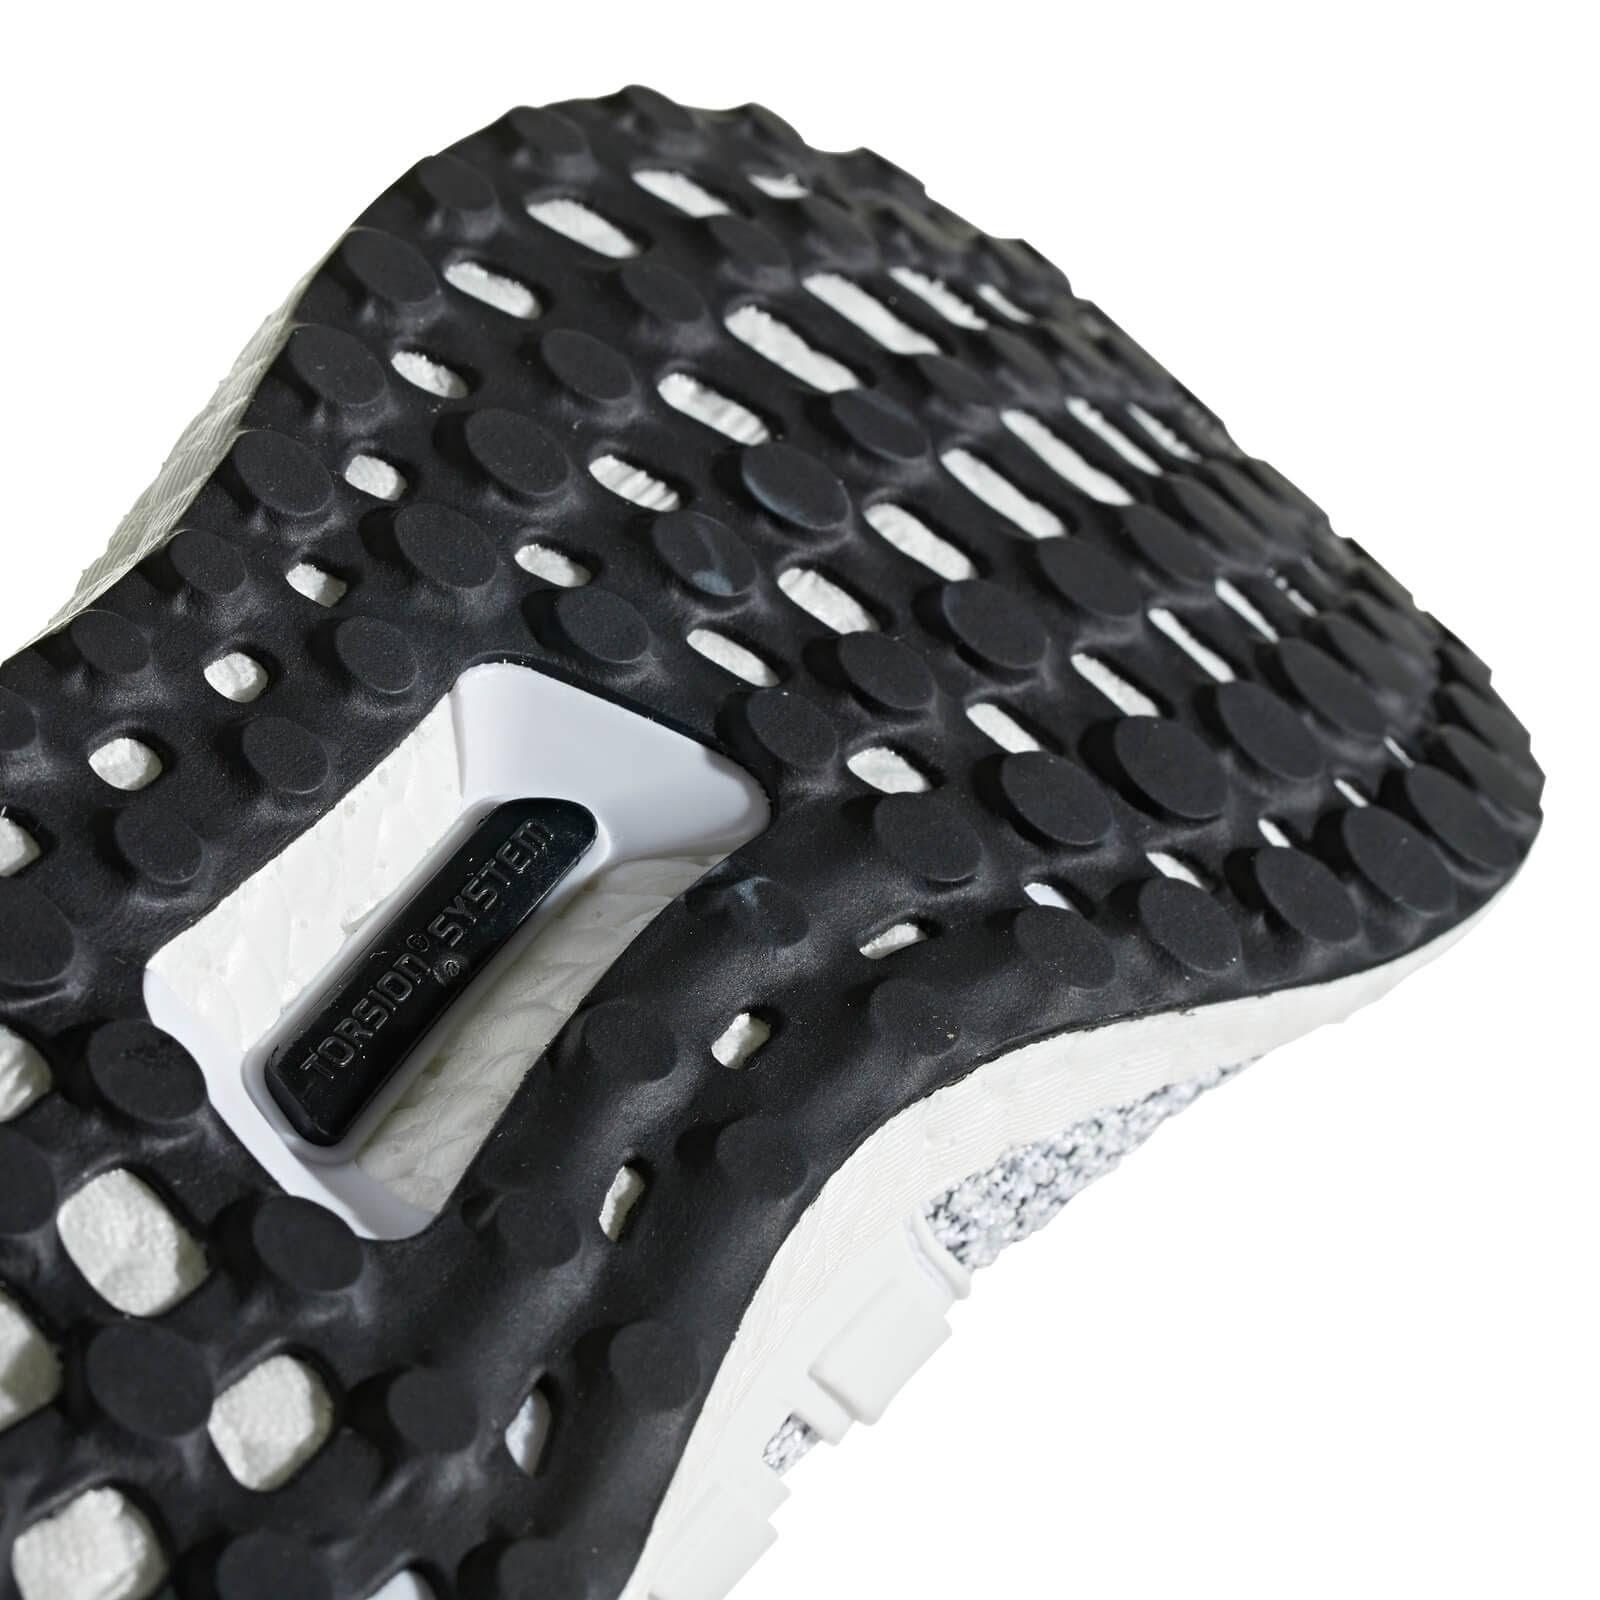 Ultraboost F36124 Ultraboost Ultraboost F36124 Ftwrwhite Adidas Adidas Ftwrwhite Adidas iTOkuXZP